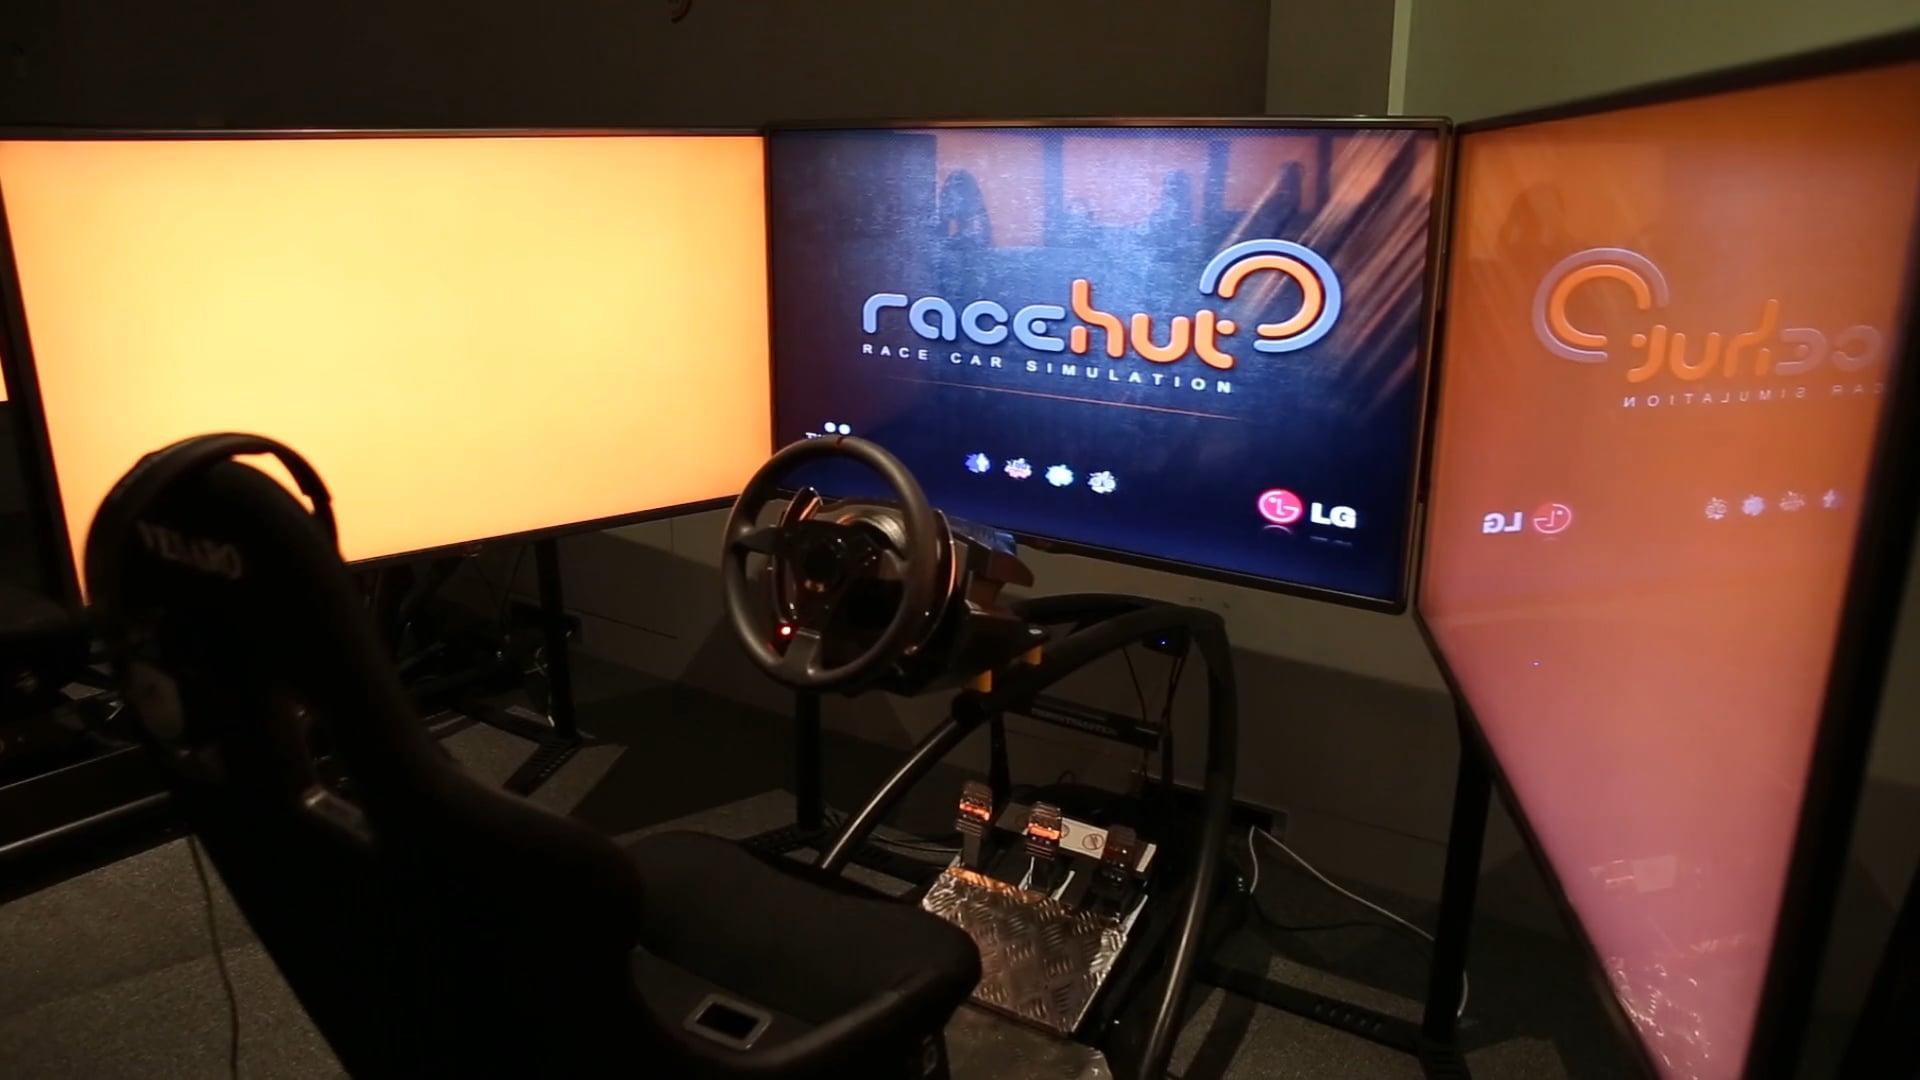 The Race Hut